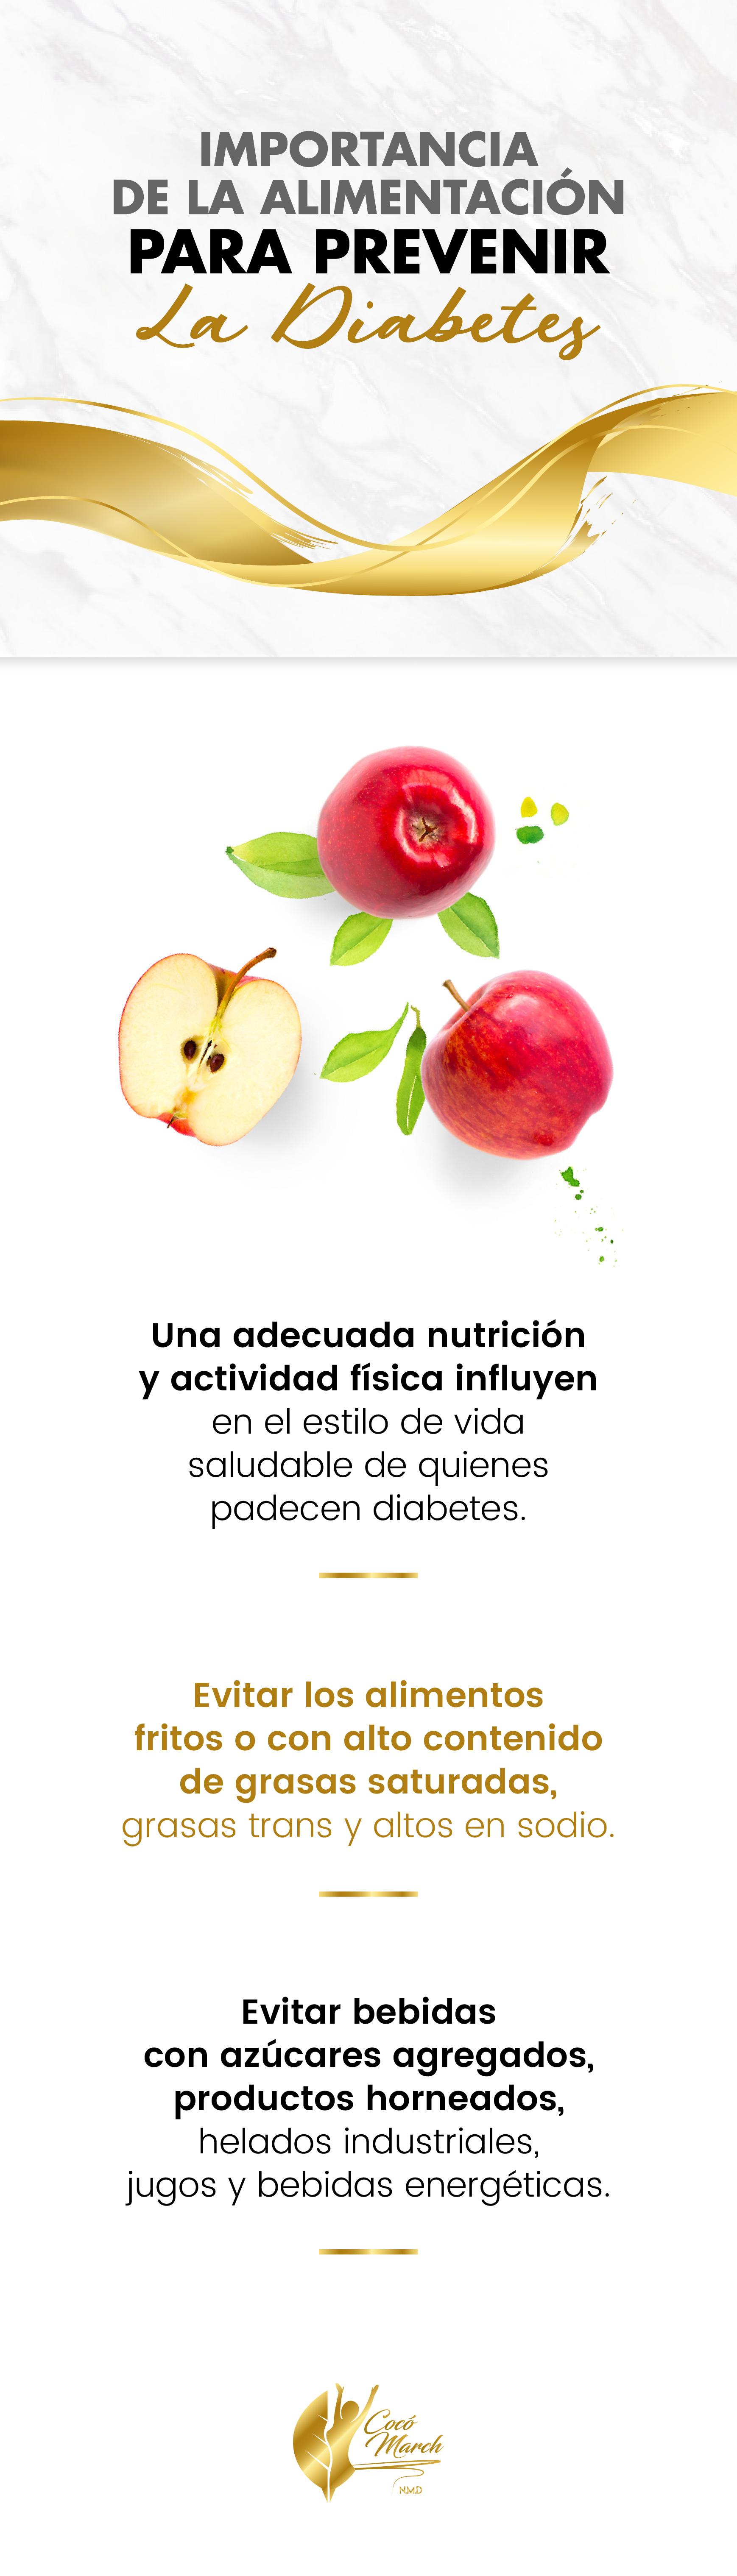 importancia-de-la-alimentacion-para-prevenir-la-diabetes